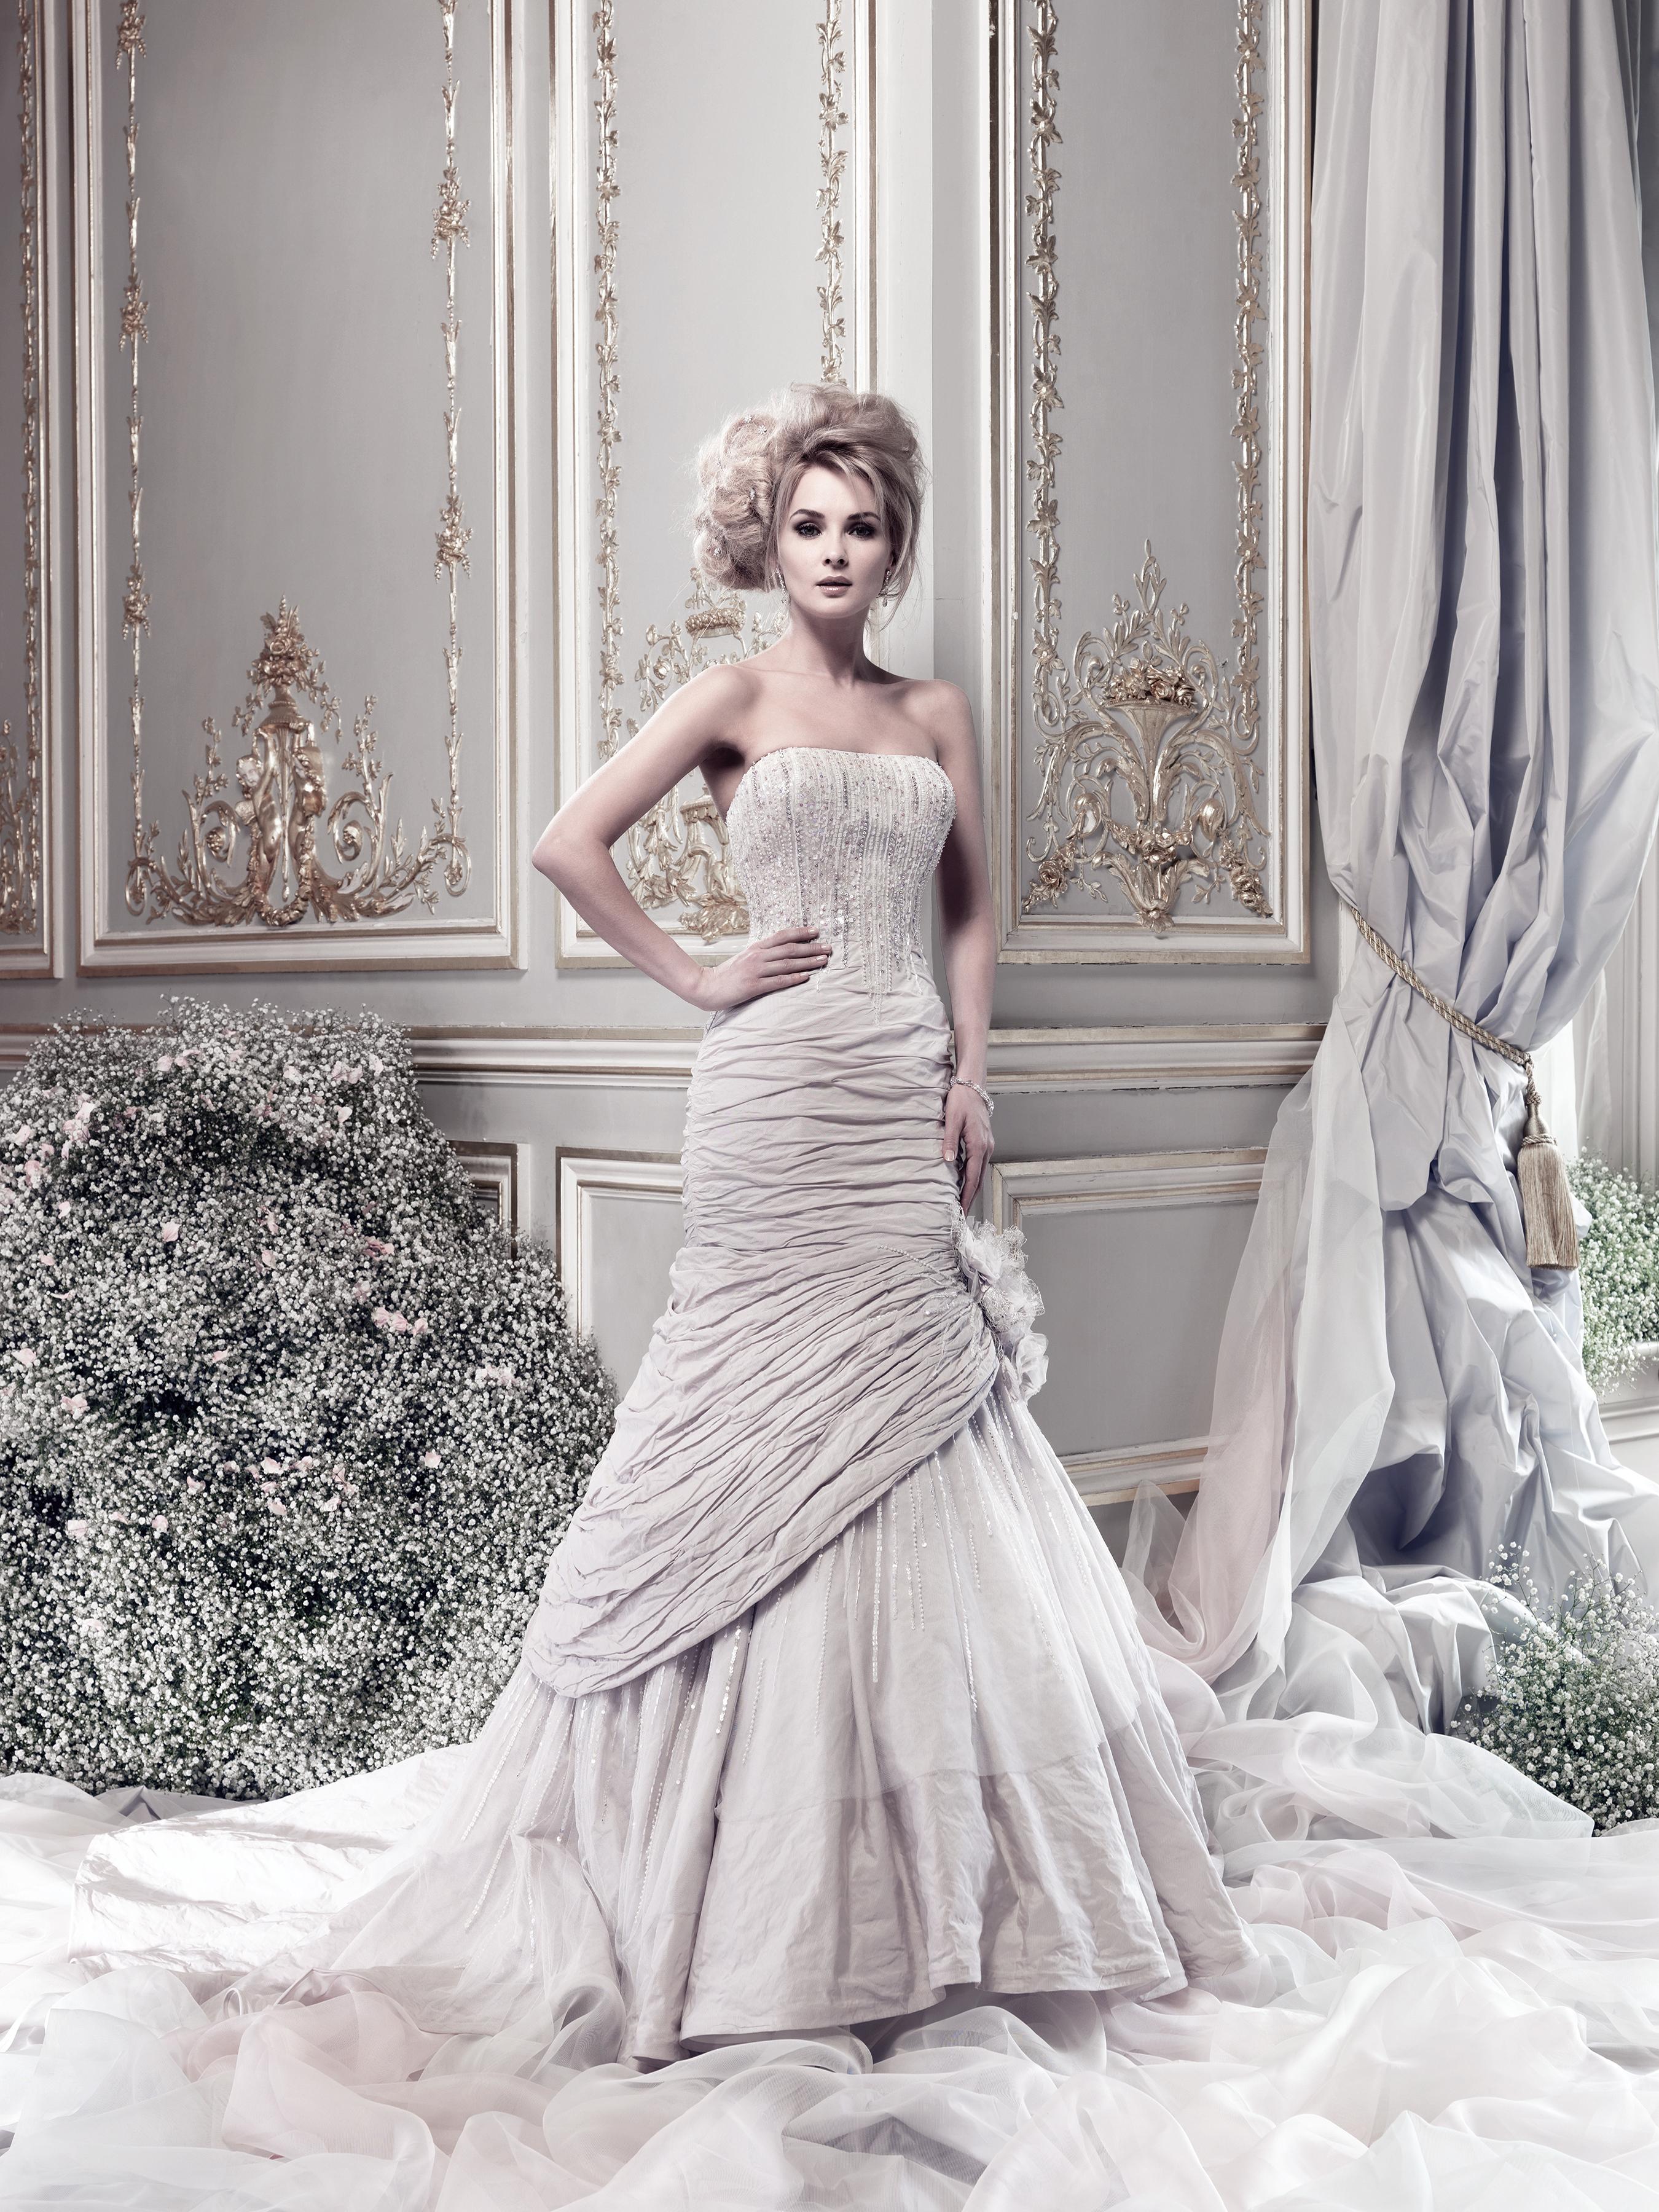 Design By <a Hrefianstuartbride Ian Stuart Cosmopolitan In Pale Lilac: Pale Lilac Wedding Dress At Reisefeber.org